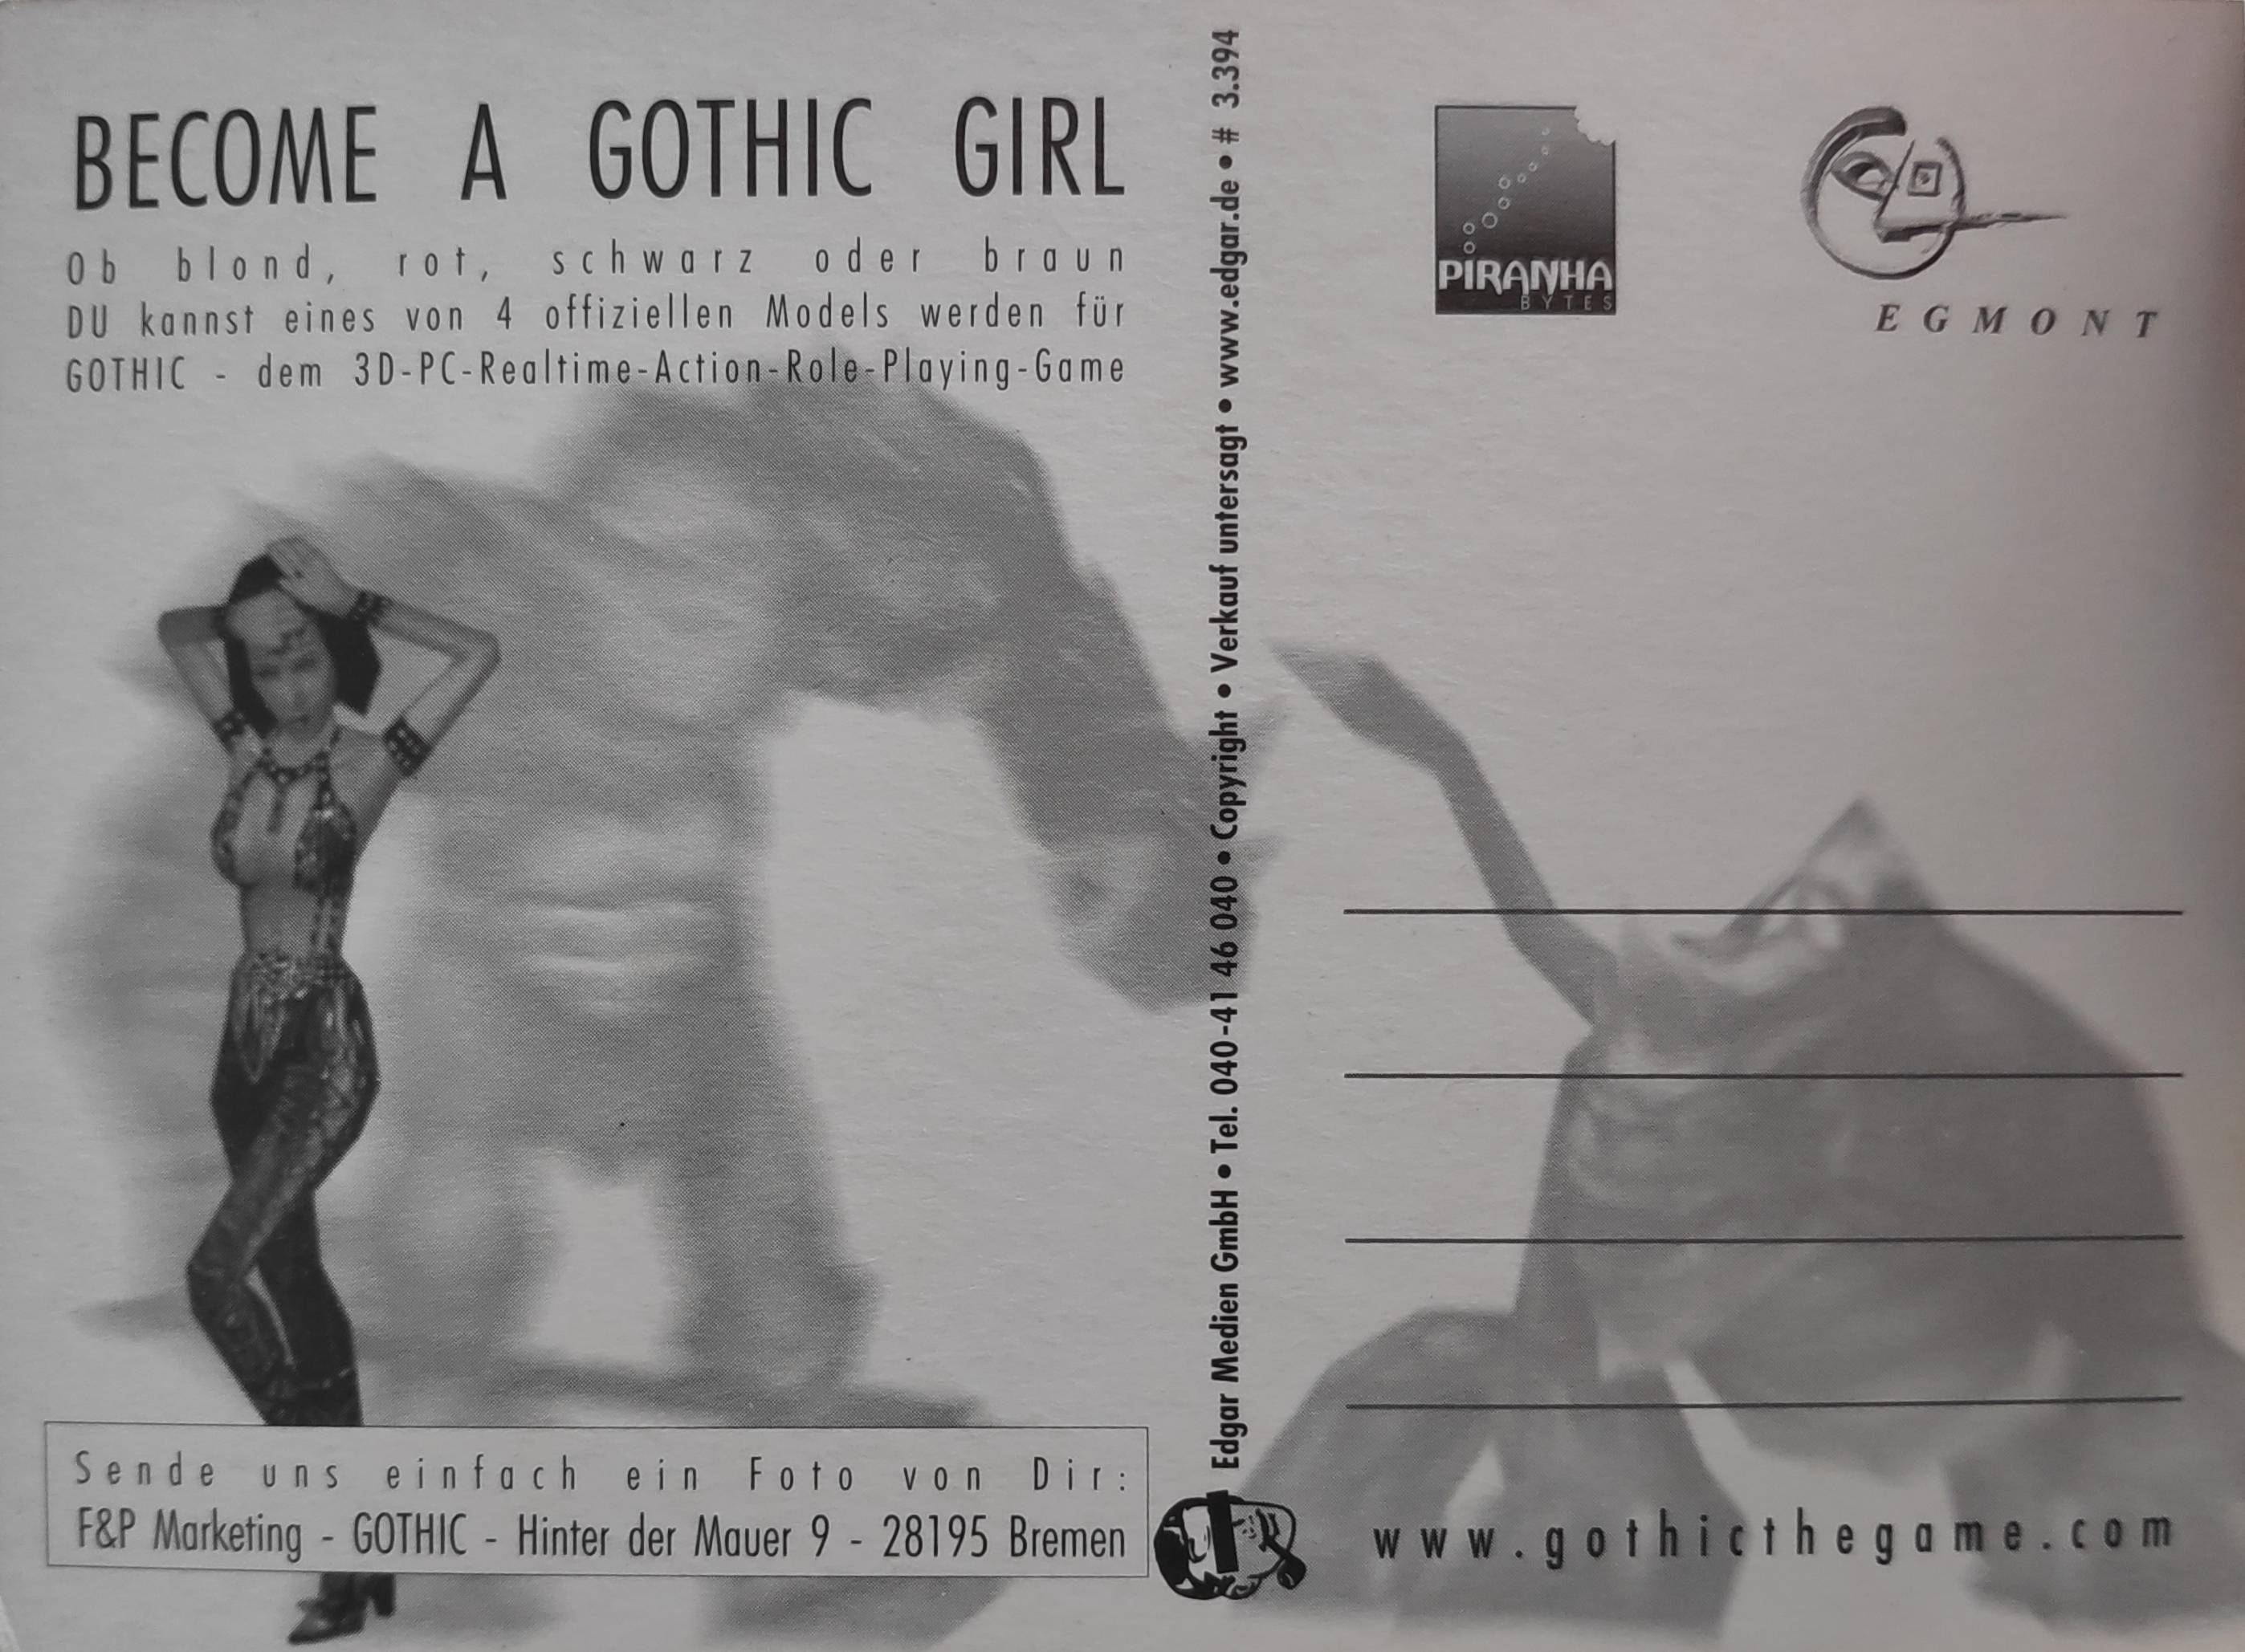 Edgar Karte Photo: 'Become a Gothic Girl No2' Rückseite